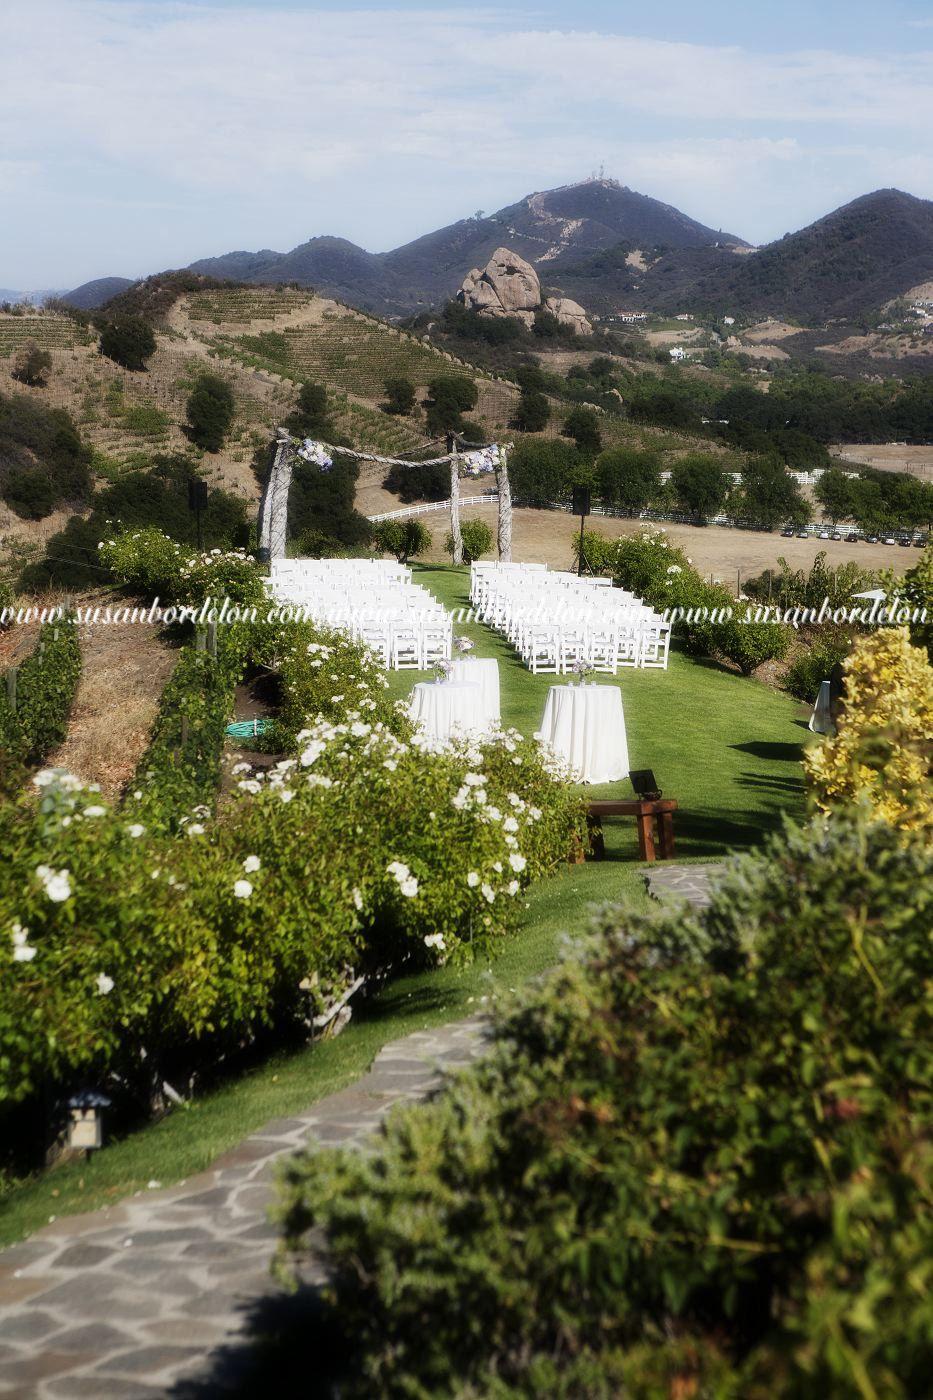 Saddlerock Ranch Wedding.Chateau Le Dome Saddlerock Ranch Vineyard Wedding Ceremony Site